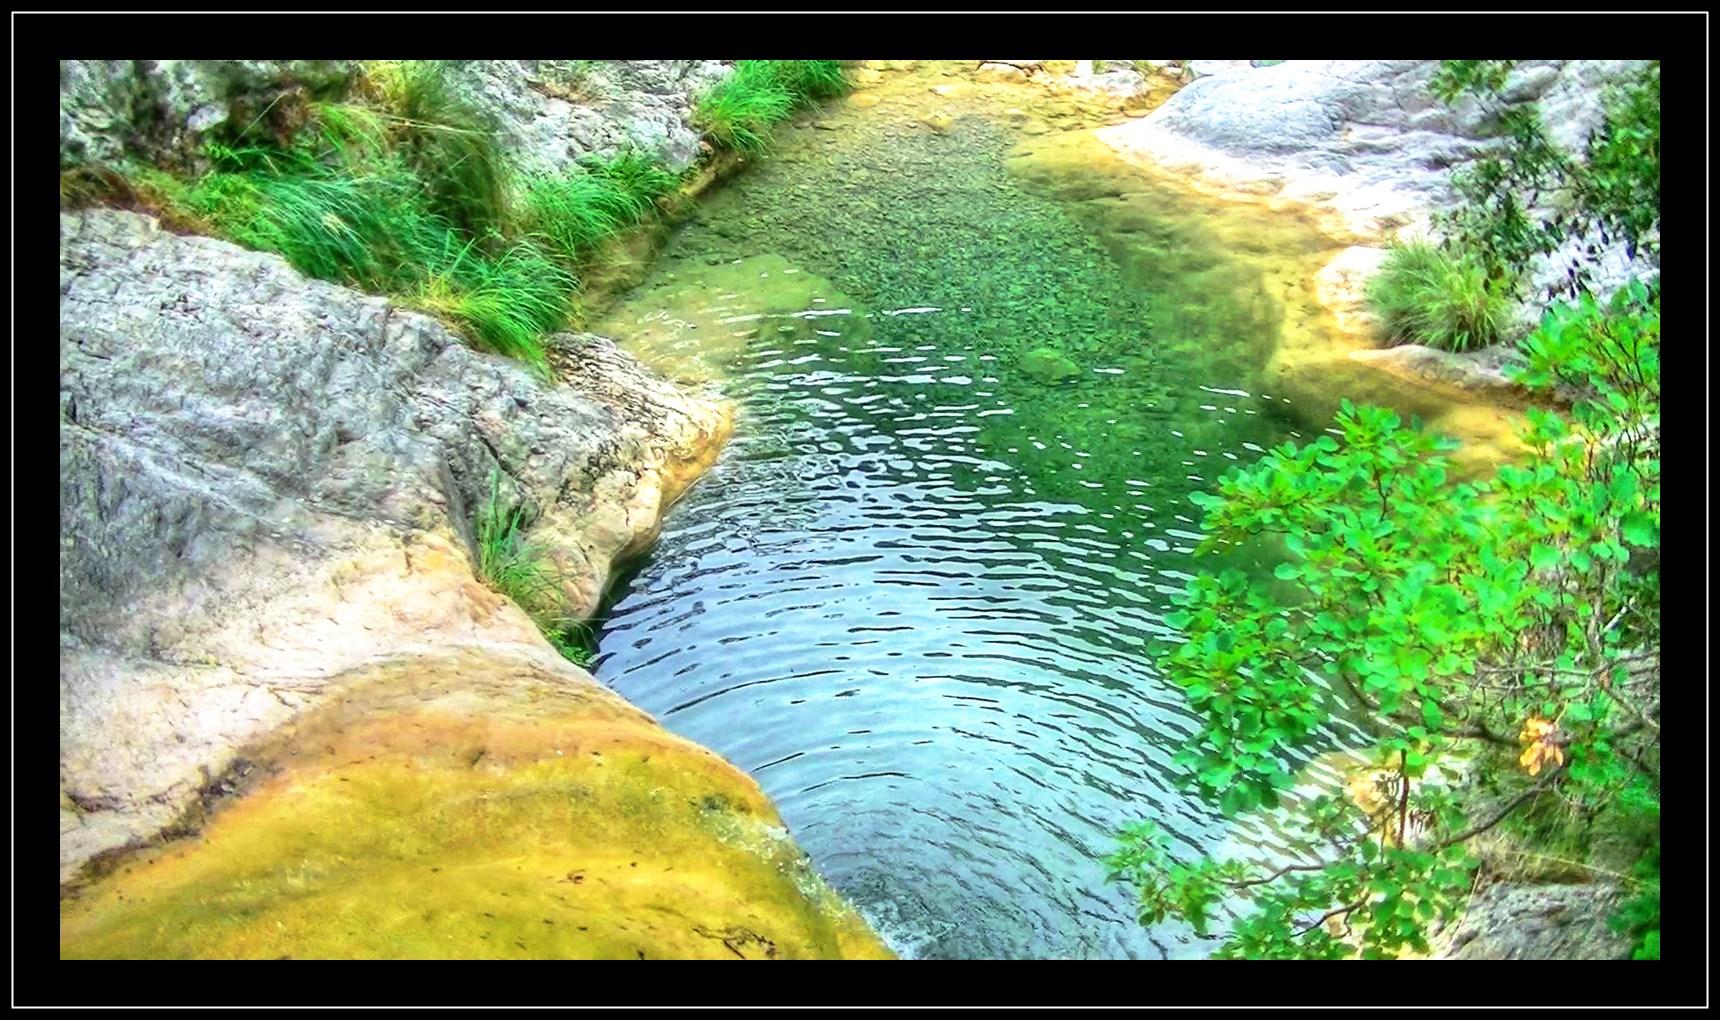 Canyon Rio Abellio